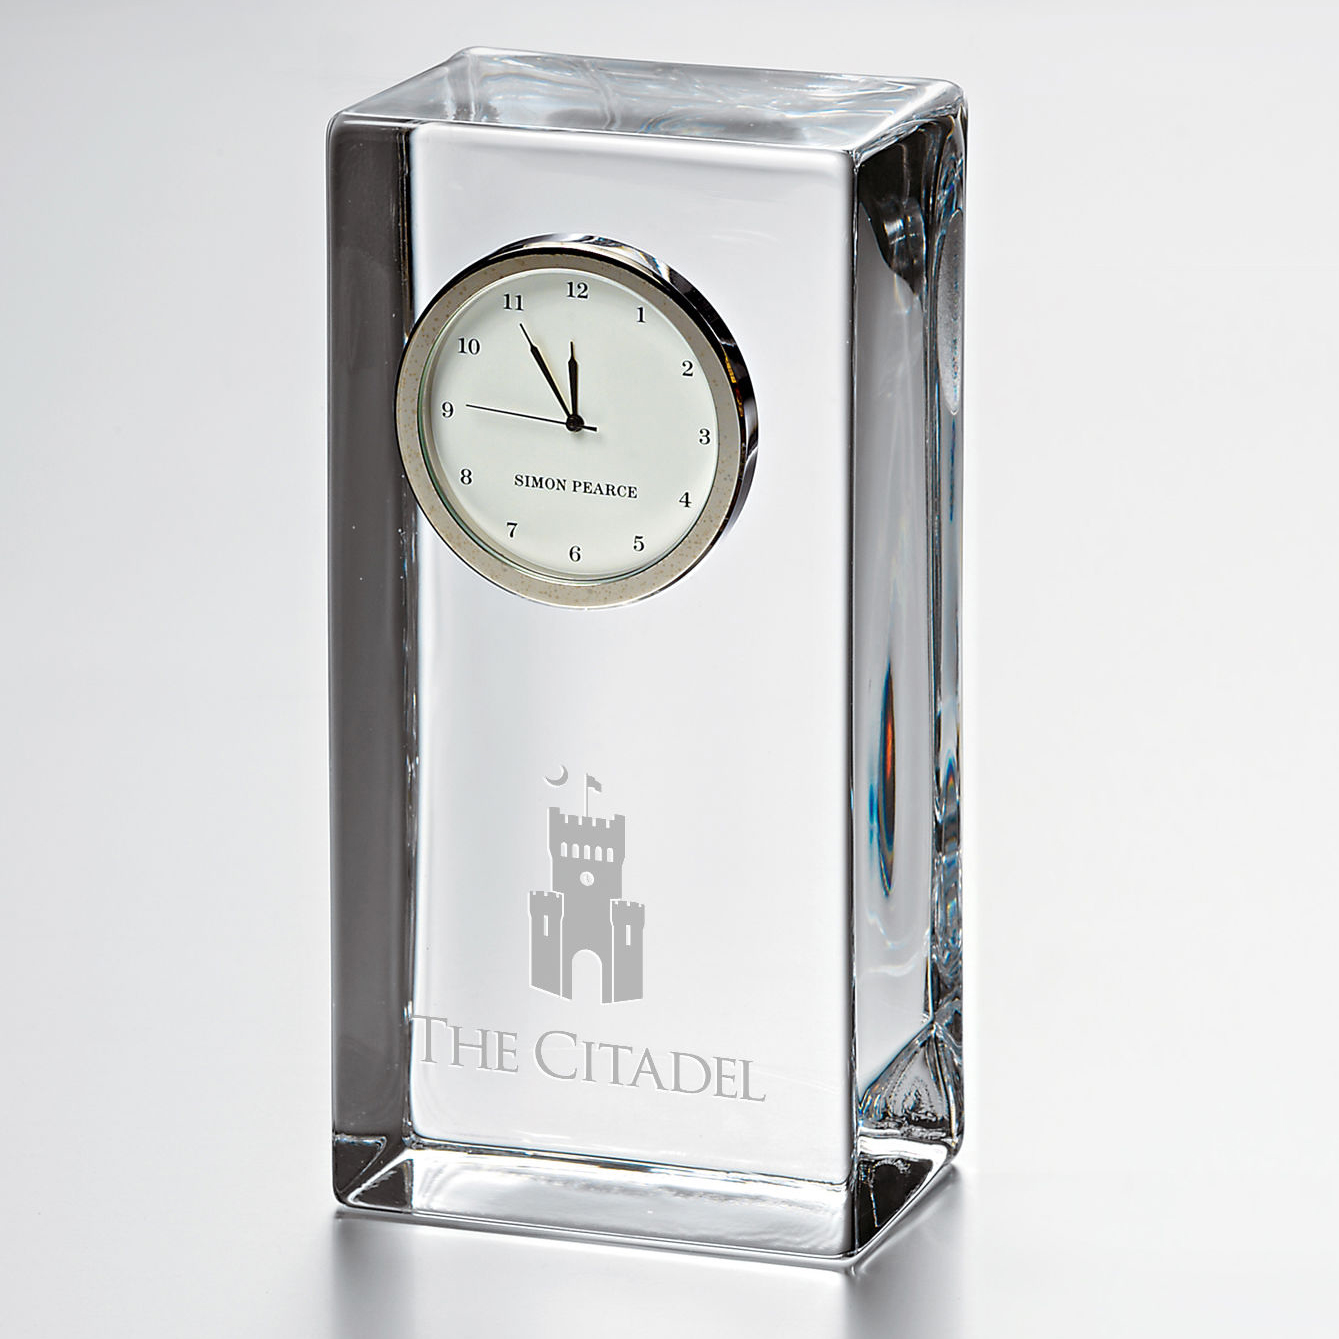 Citadel Tall Glass Desk Clock by Simon Pearce